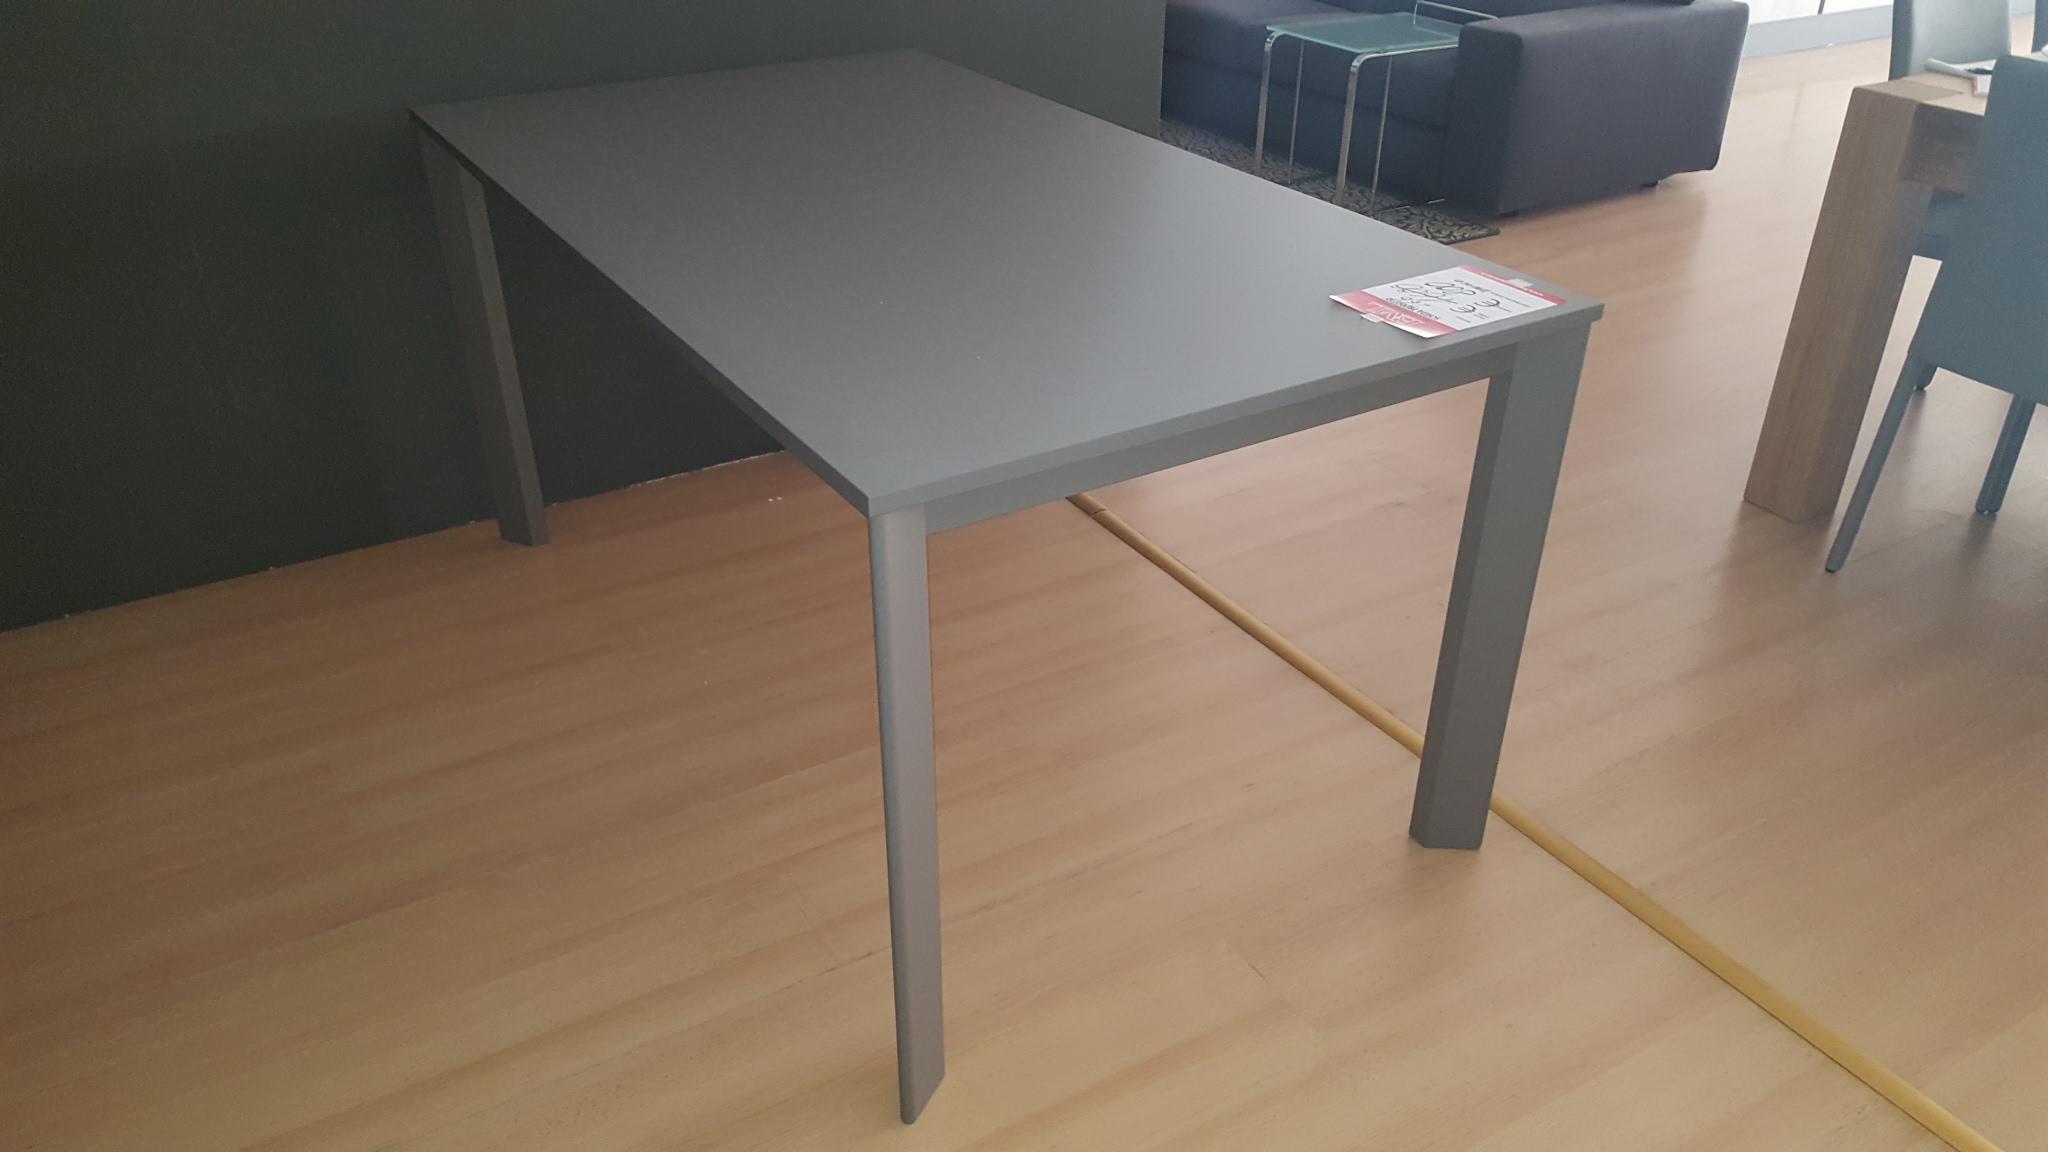 Tavolo grigio outlet mobili e arredamento a for Outlet arredamento vicenza